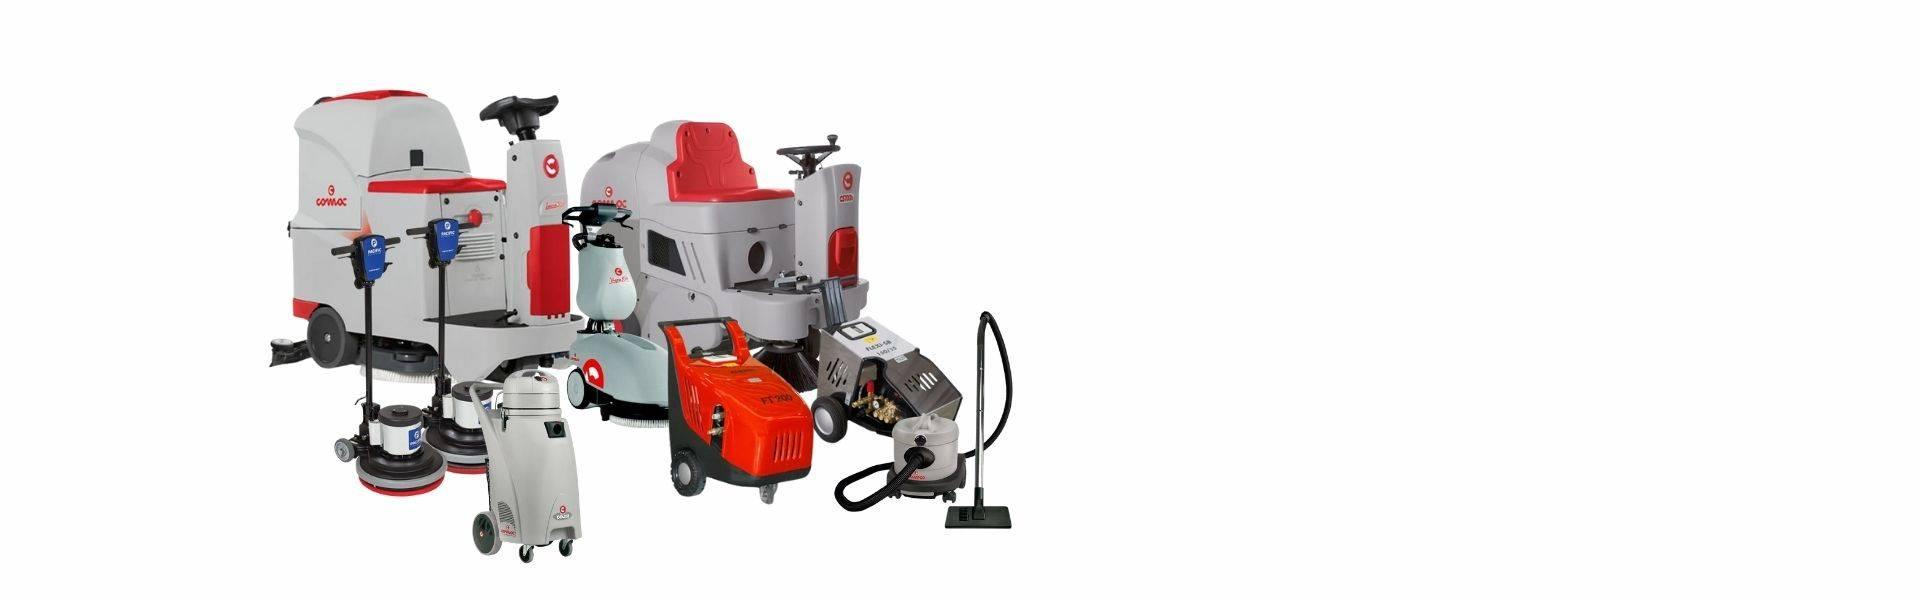 maquinas para limpieza zinner